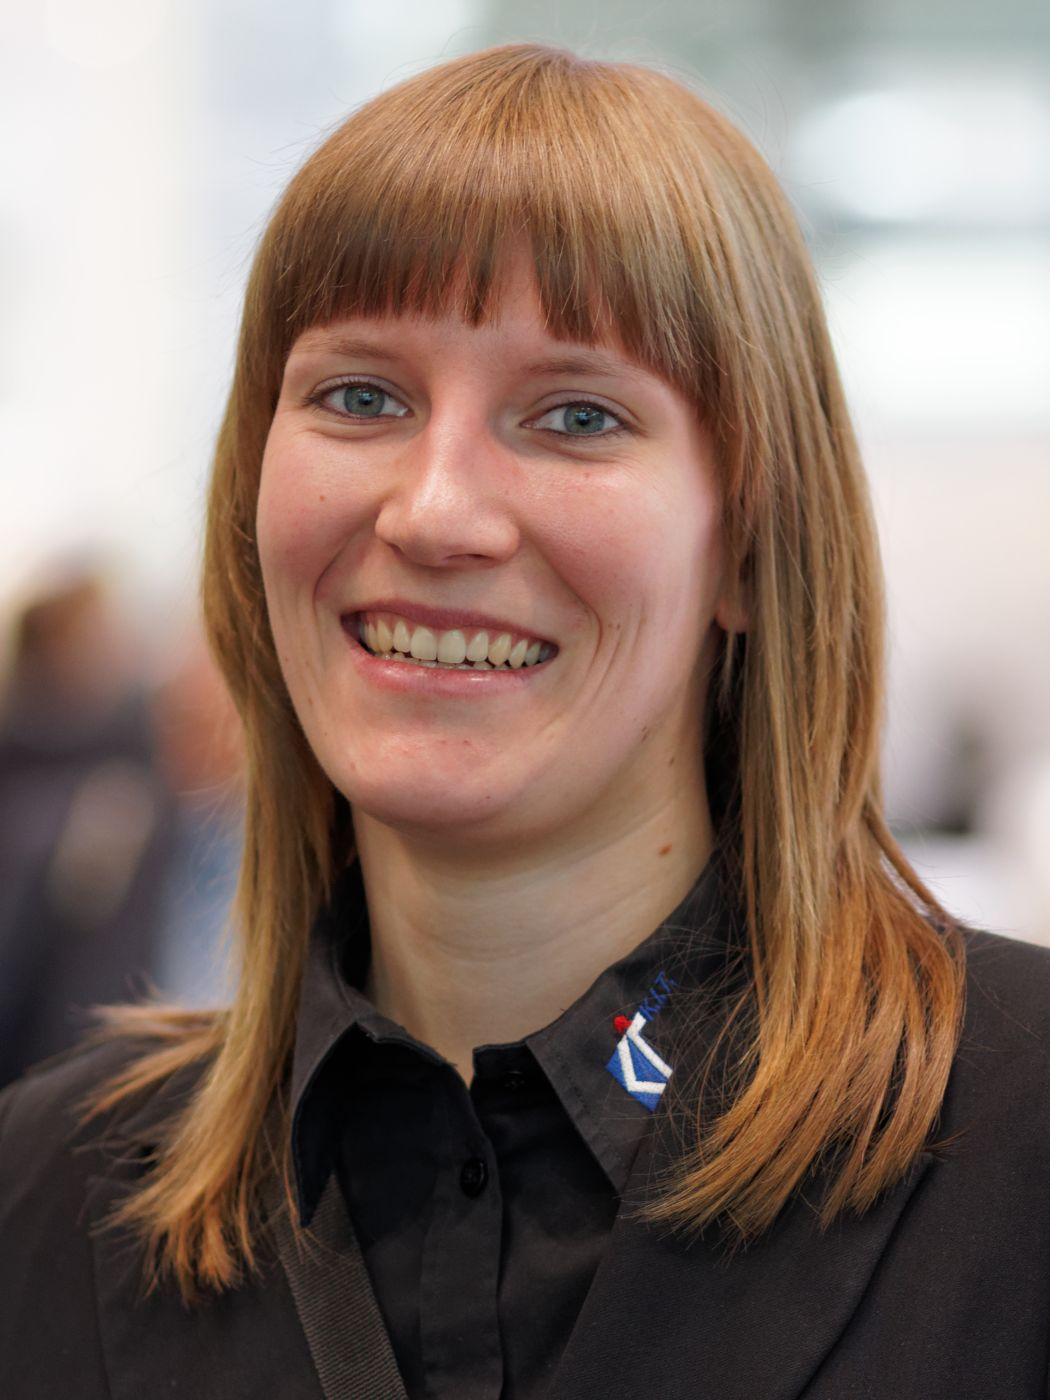 Eva Schubert, K.I.T. Group GmbH, DE